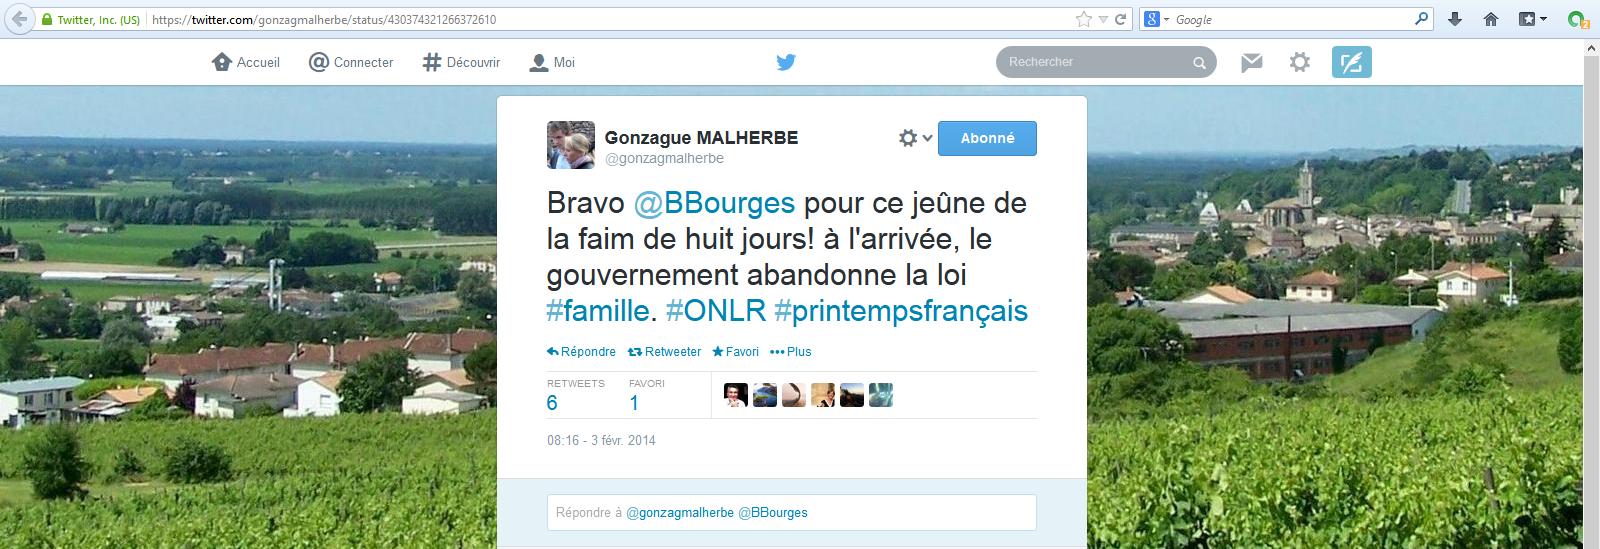 Gonzague-Malherbe-Beatrice-Bourges